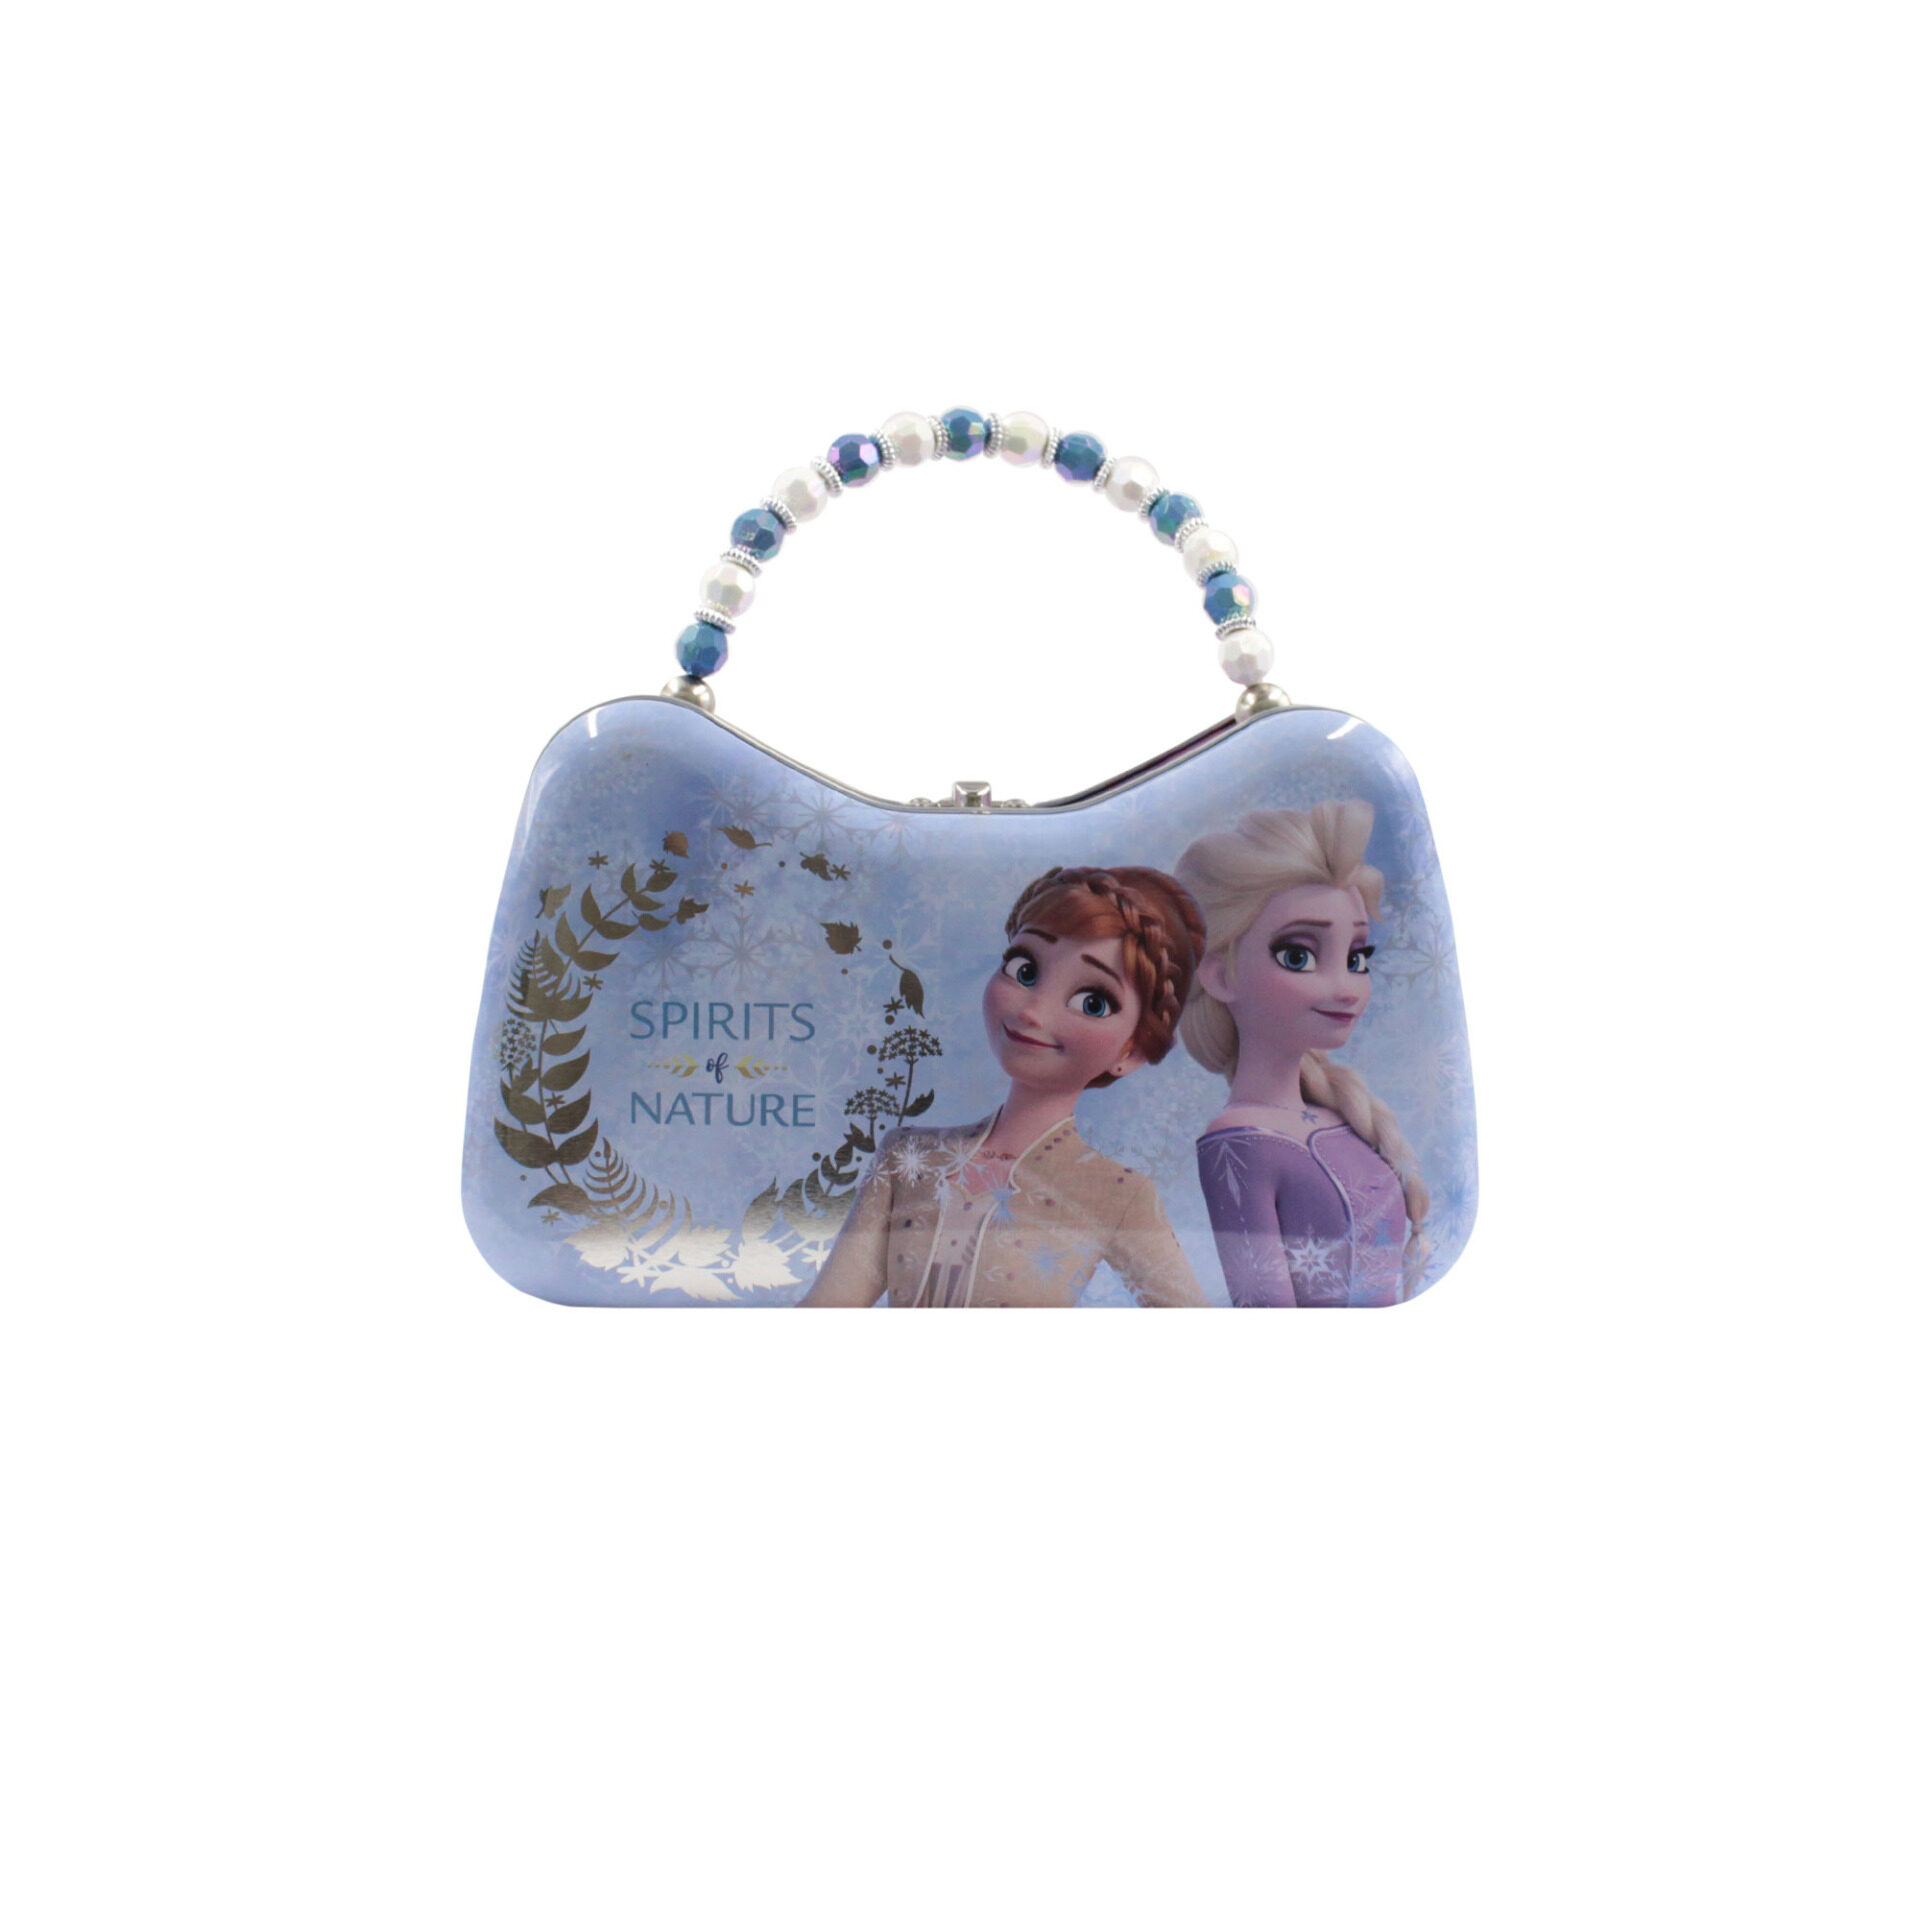 Disney Frozen 2 Princess Elsa & Anna Spirits of Nature Hard Case With Handle For Girls